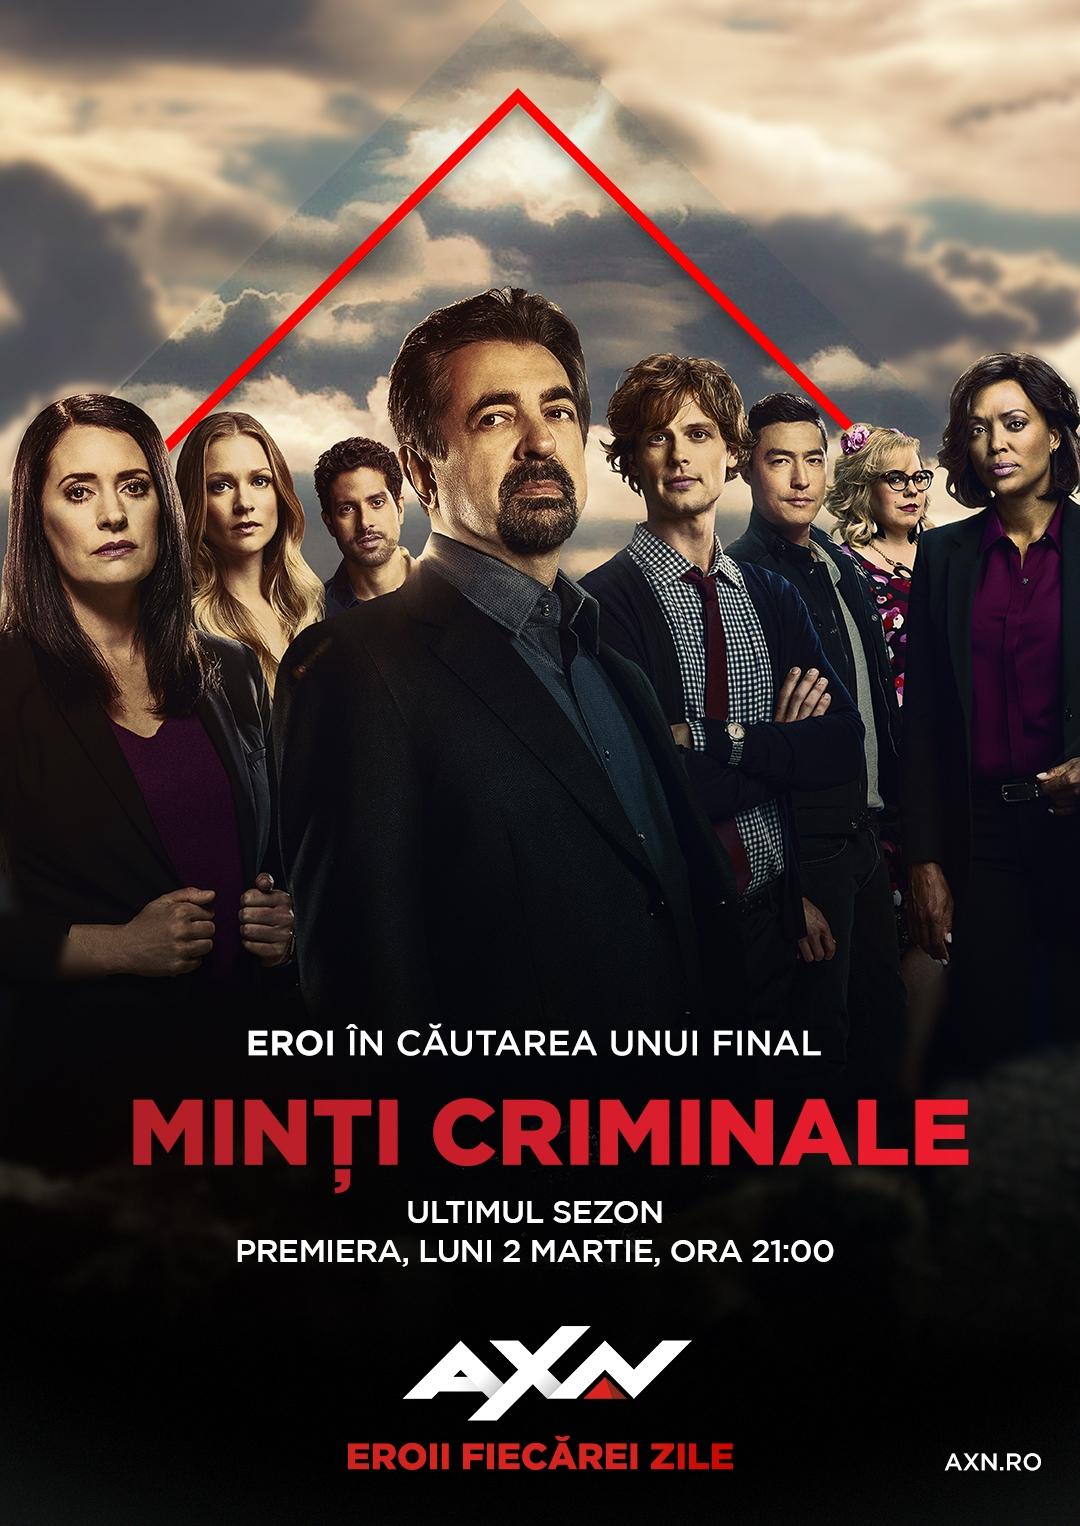 KV MINTI CRIMINALE S15